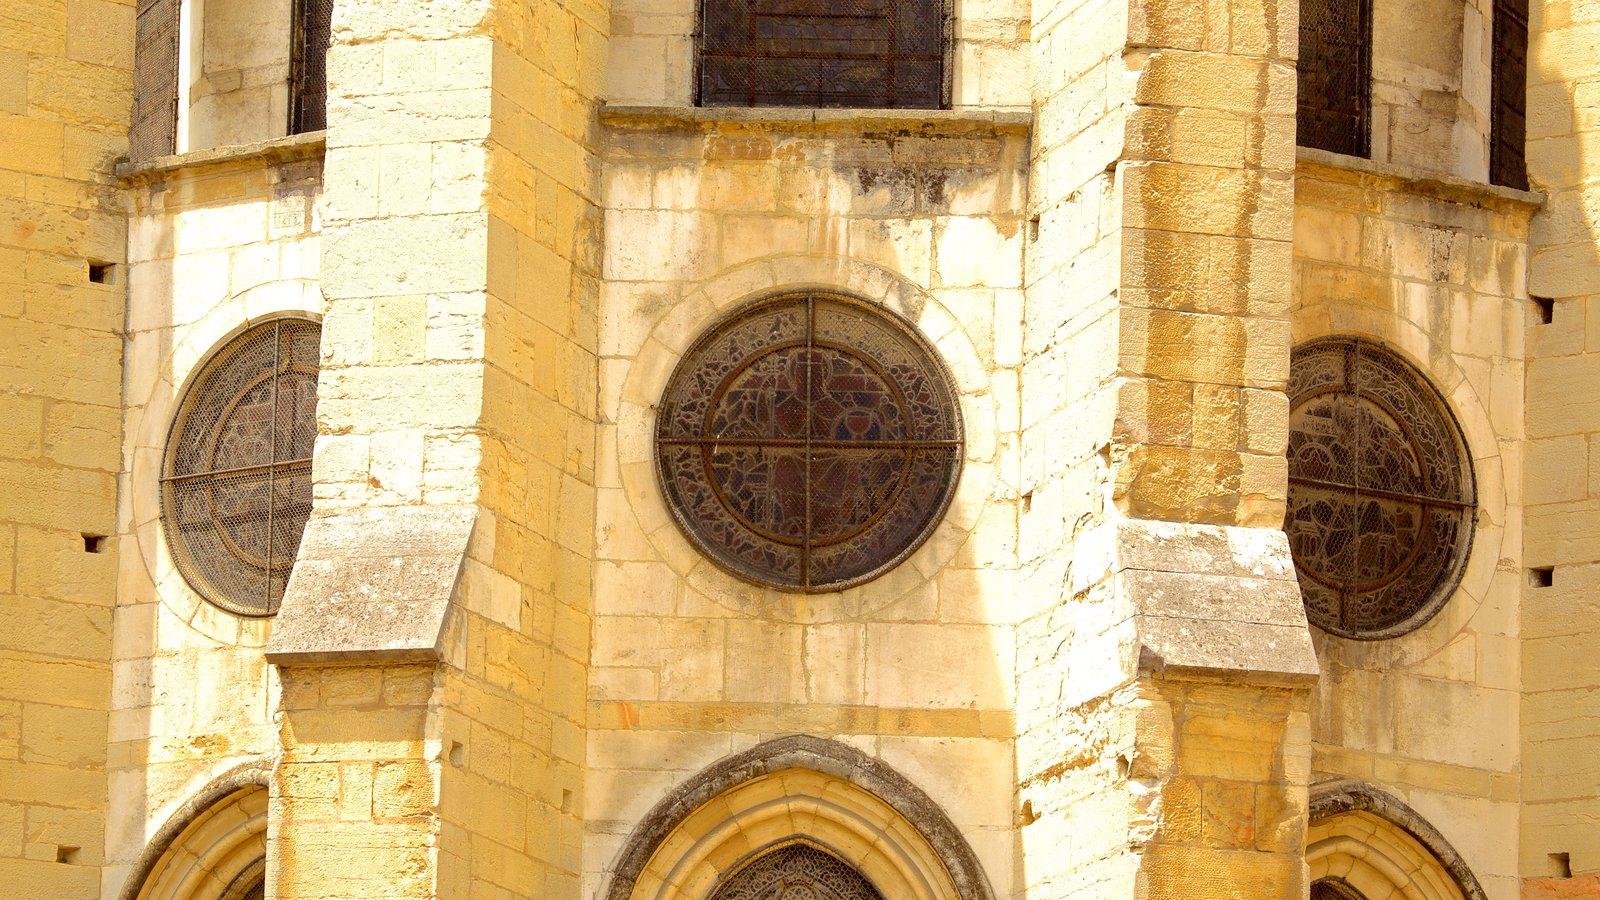 Igreja de Notre Dame mostrando elementos de patrimônio